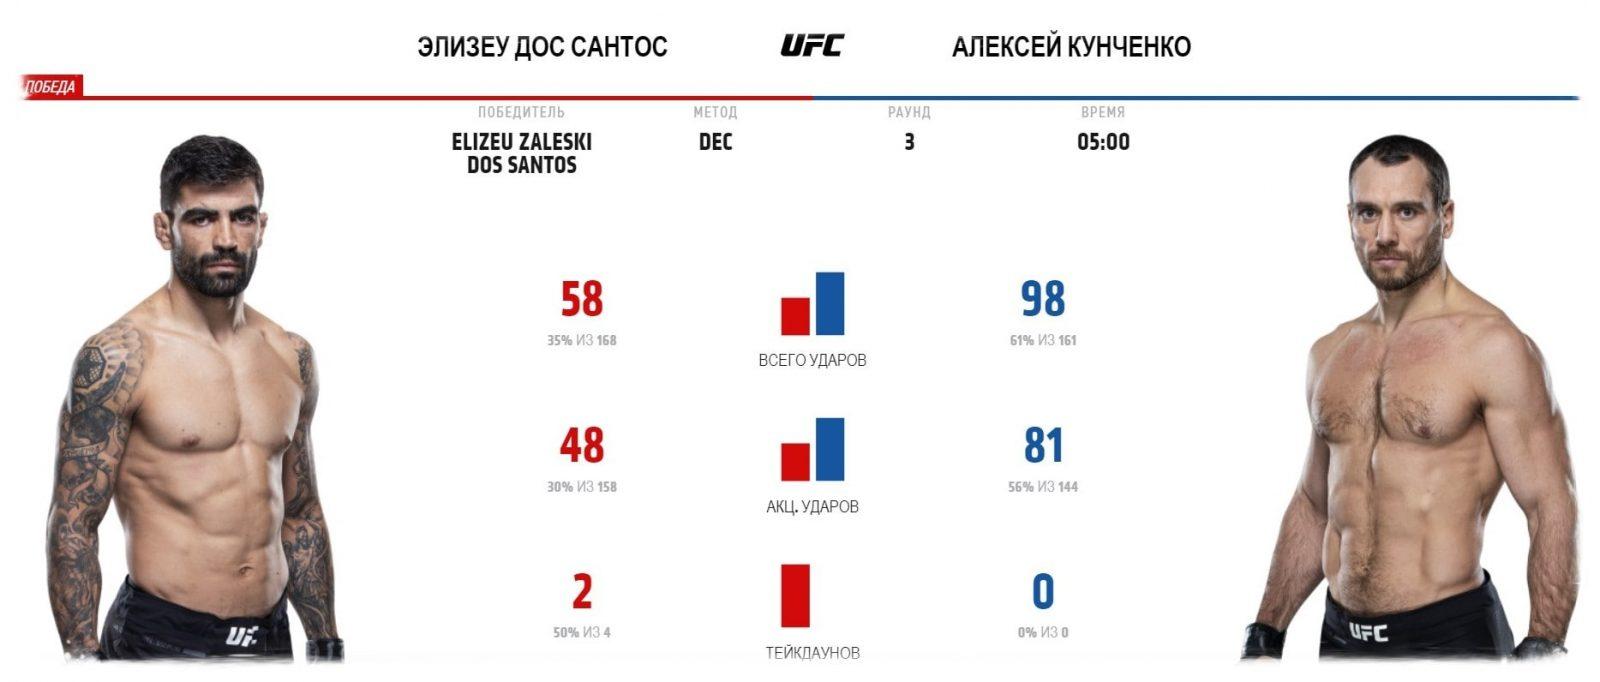 video-boya-aleksej-kunchenko-ehlizeu-zaleski-dos-santos-alexey-kunchenko-elizeu-zaleski-dos-santos-ufc-fight-night-170